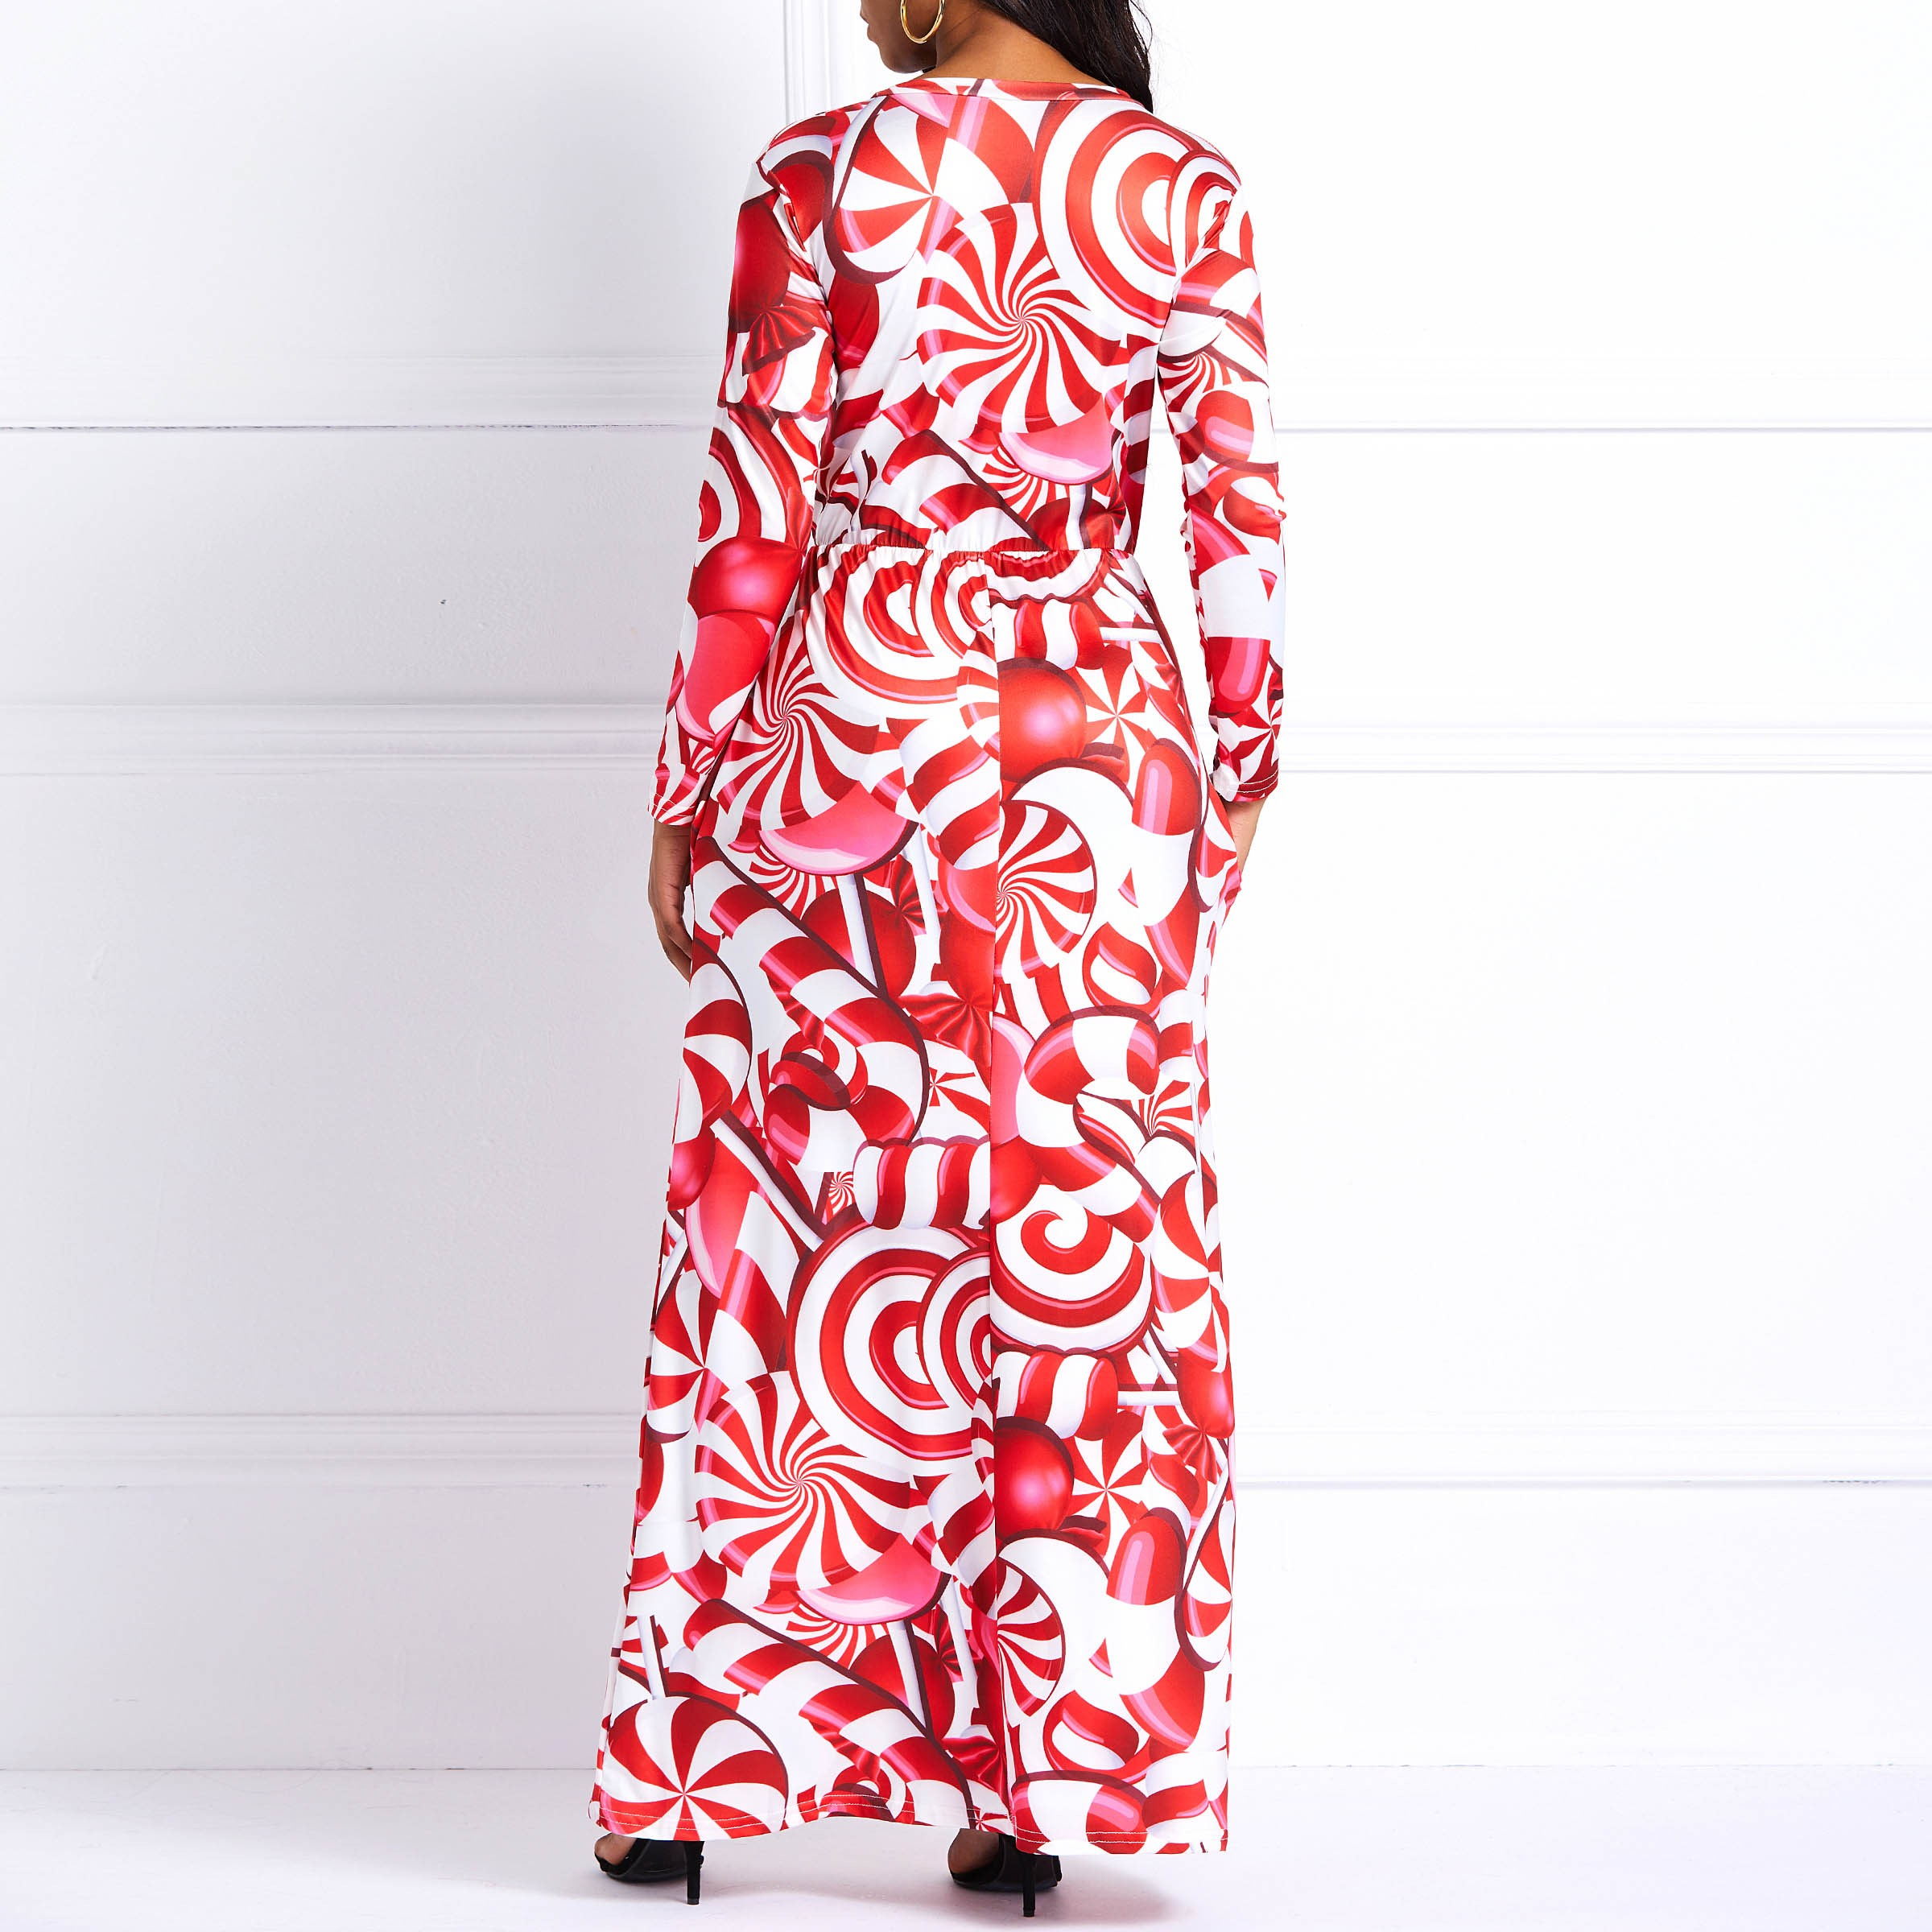 Women Long Dresses Sweet Elegant Red Casual Plus Size Milk Fiber Aline  Cartoon Print Female Fashion Party Office Lady Maxi Dress-in Dresses from  Women s ... 32f8f7d64948